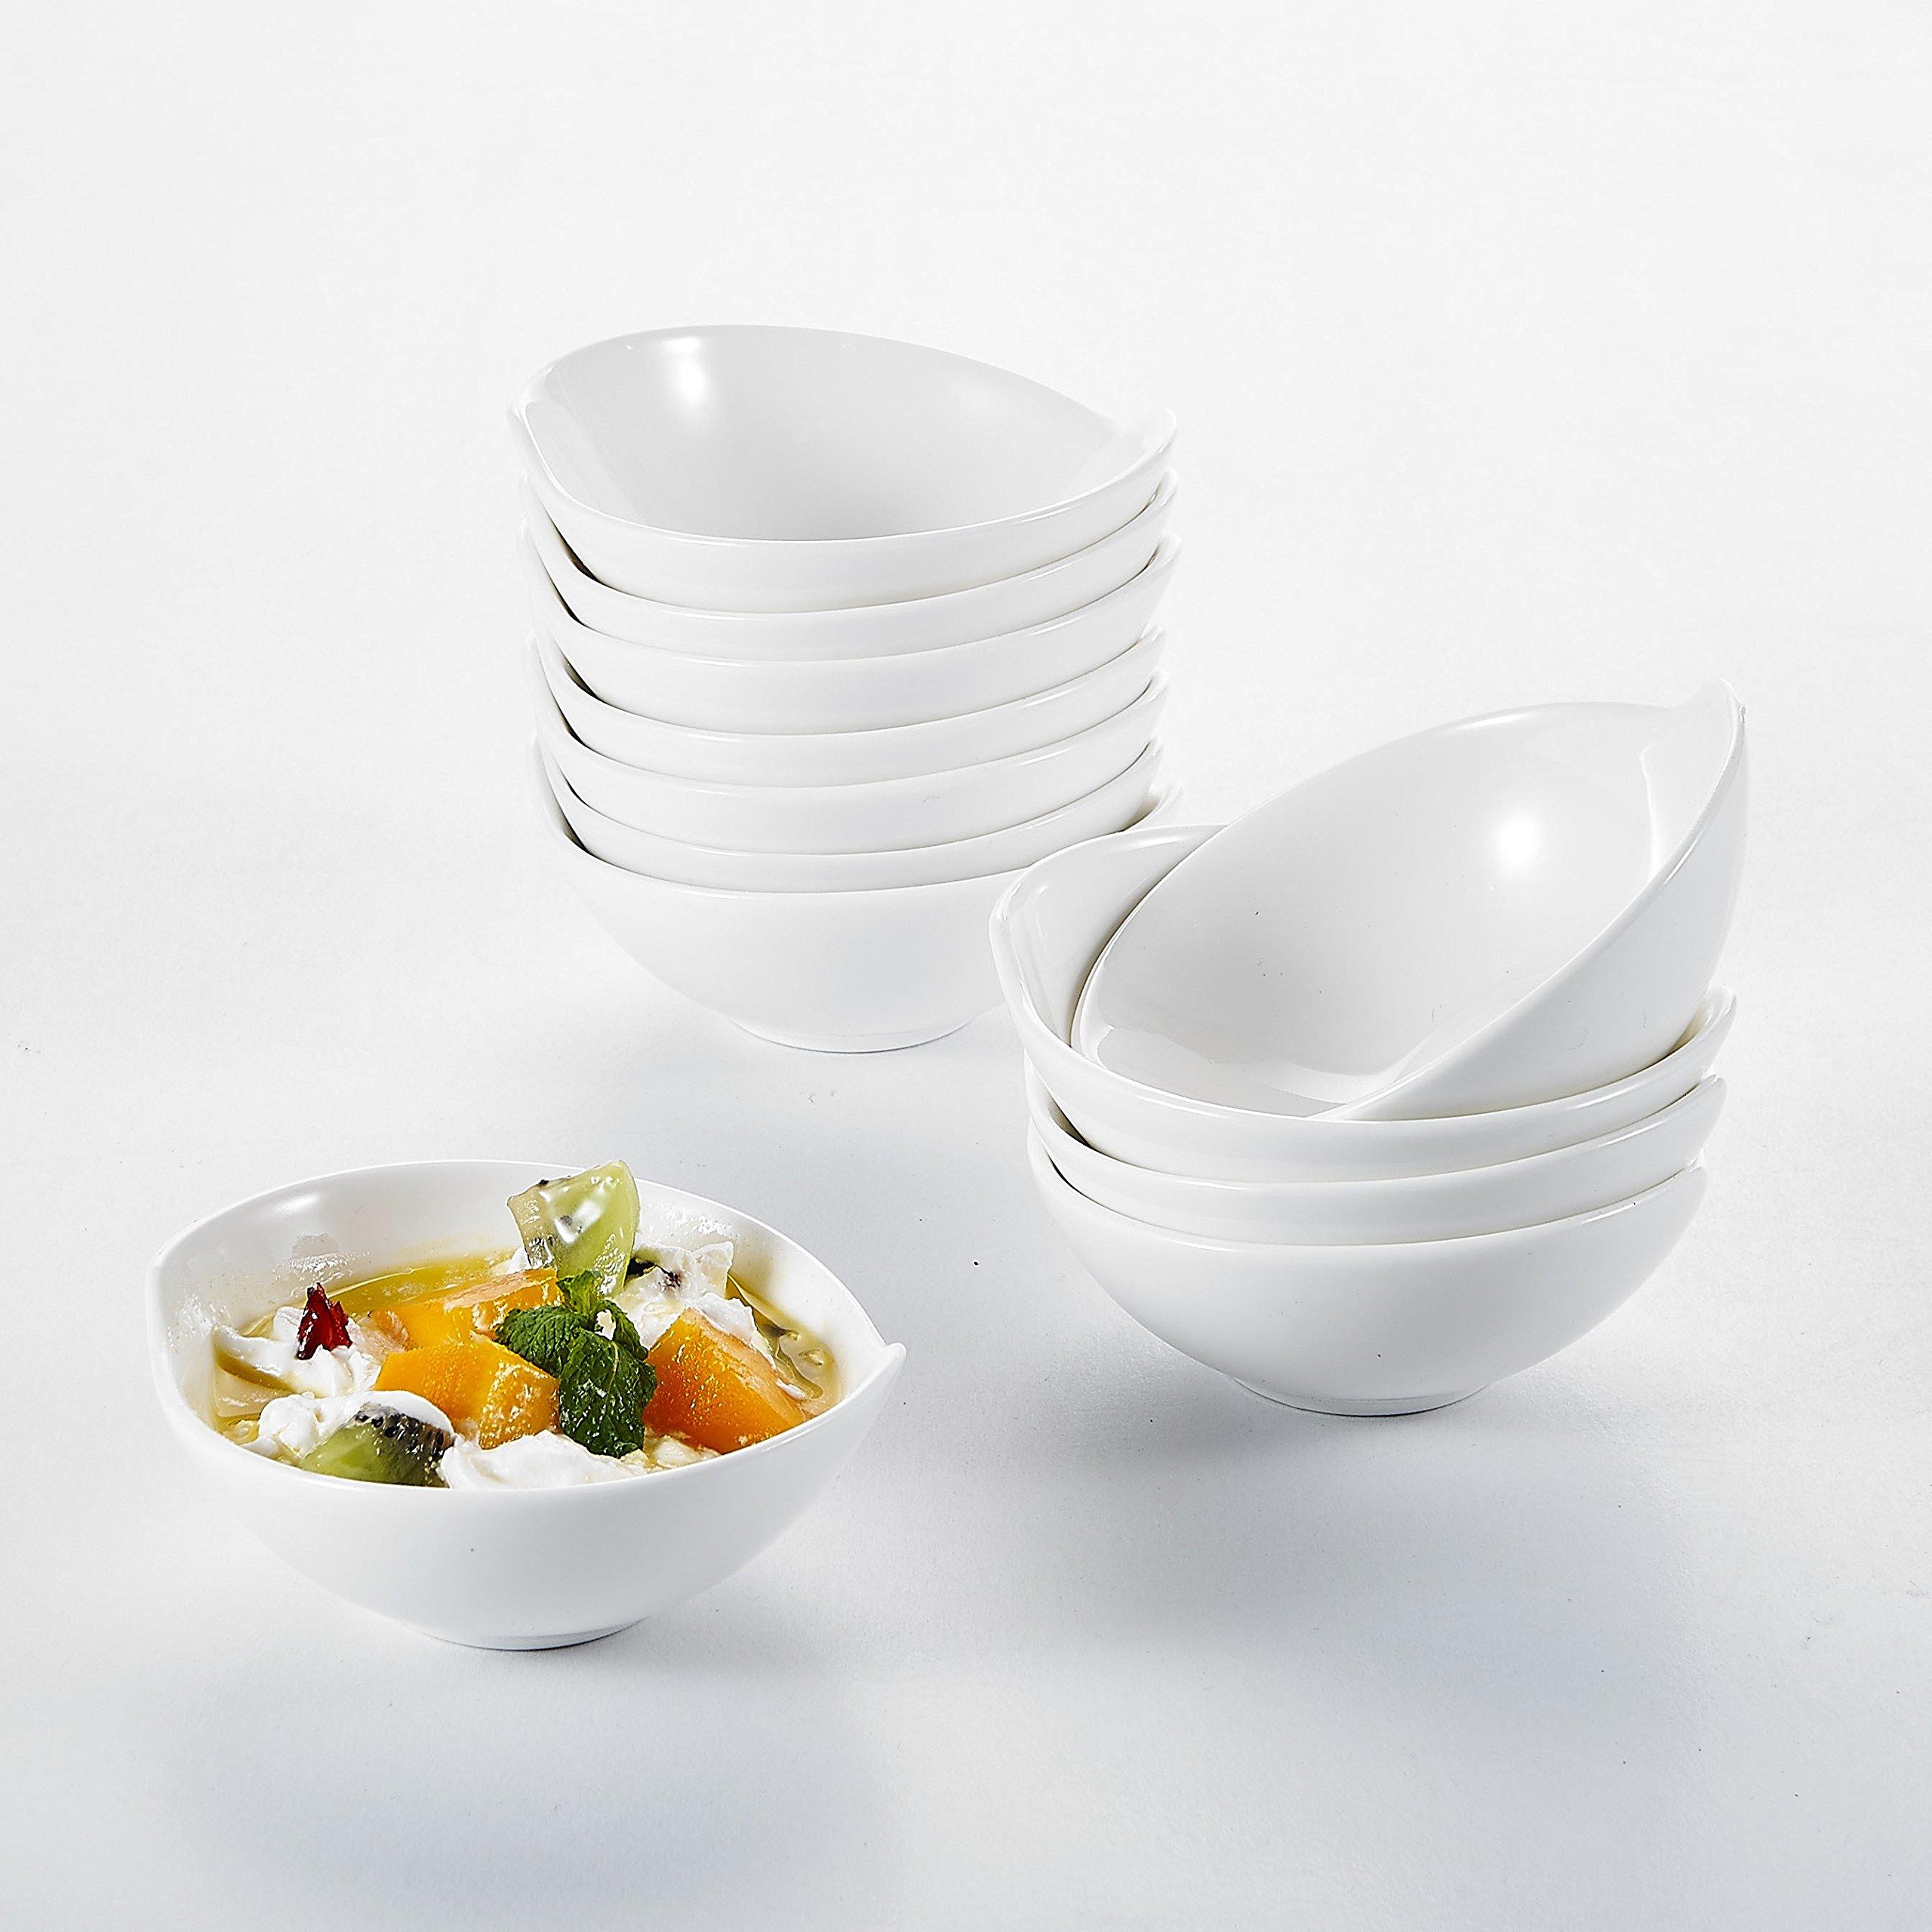 Malacasa, Series Ramekin, 4.3'' Ivory White Porcelain Serving Dishes 3.4oz Ramekins Dipping Bowl Set of 12